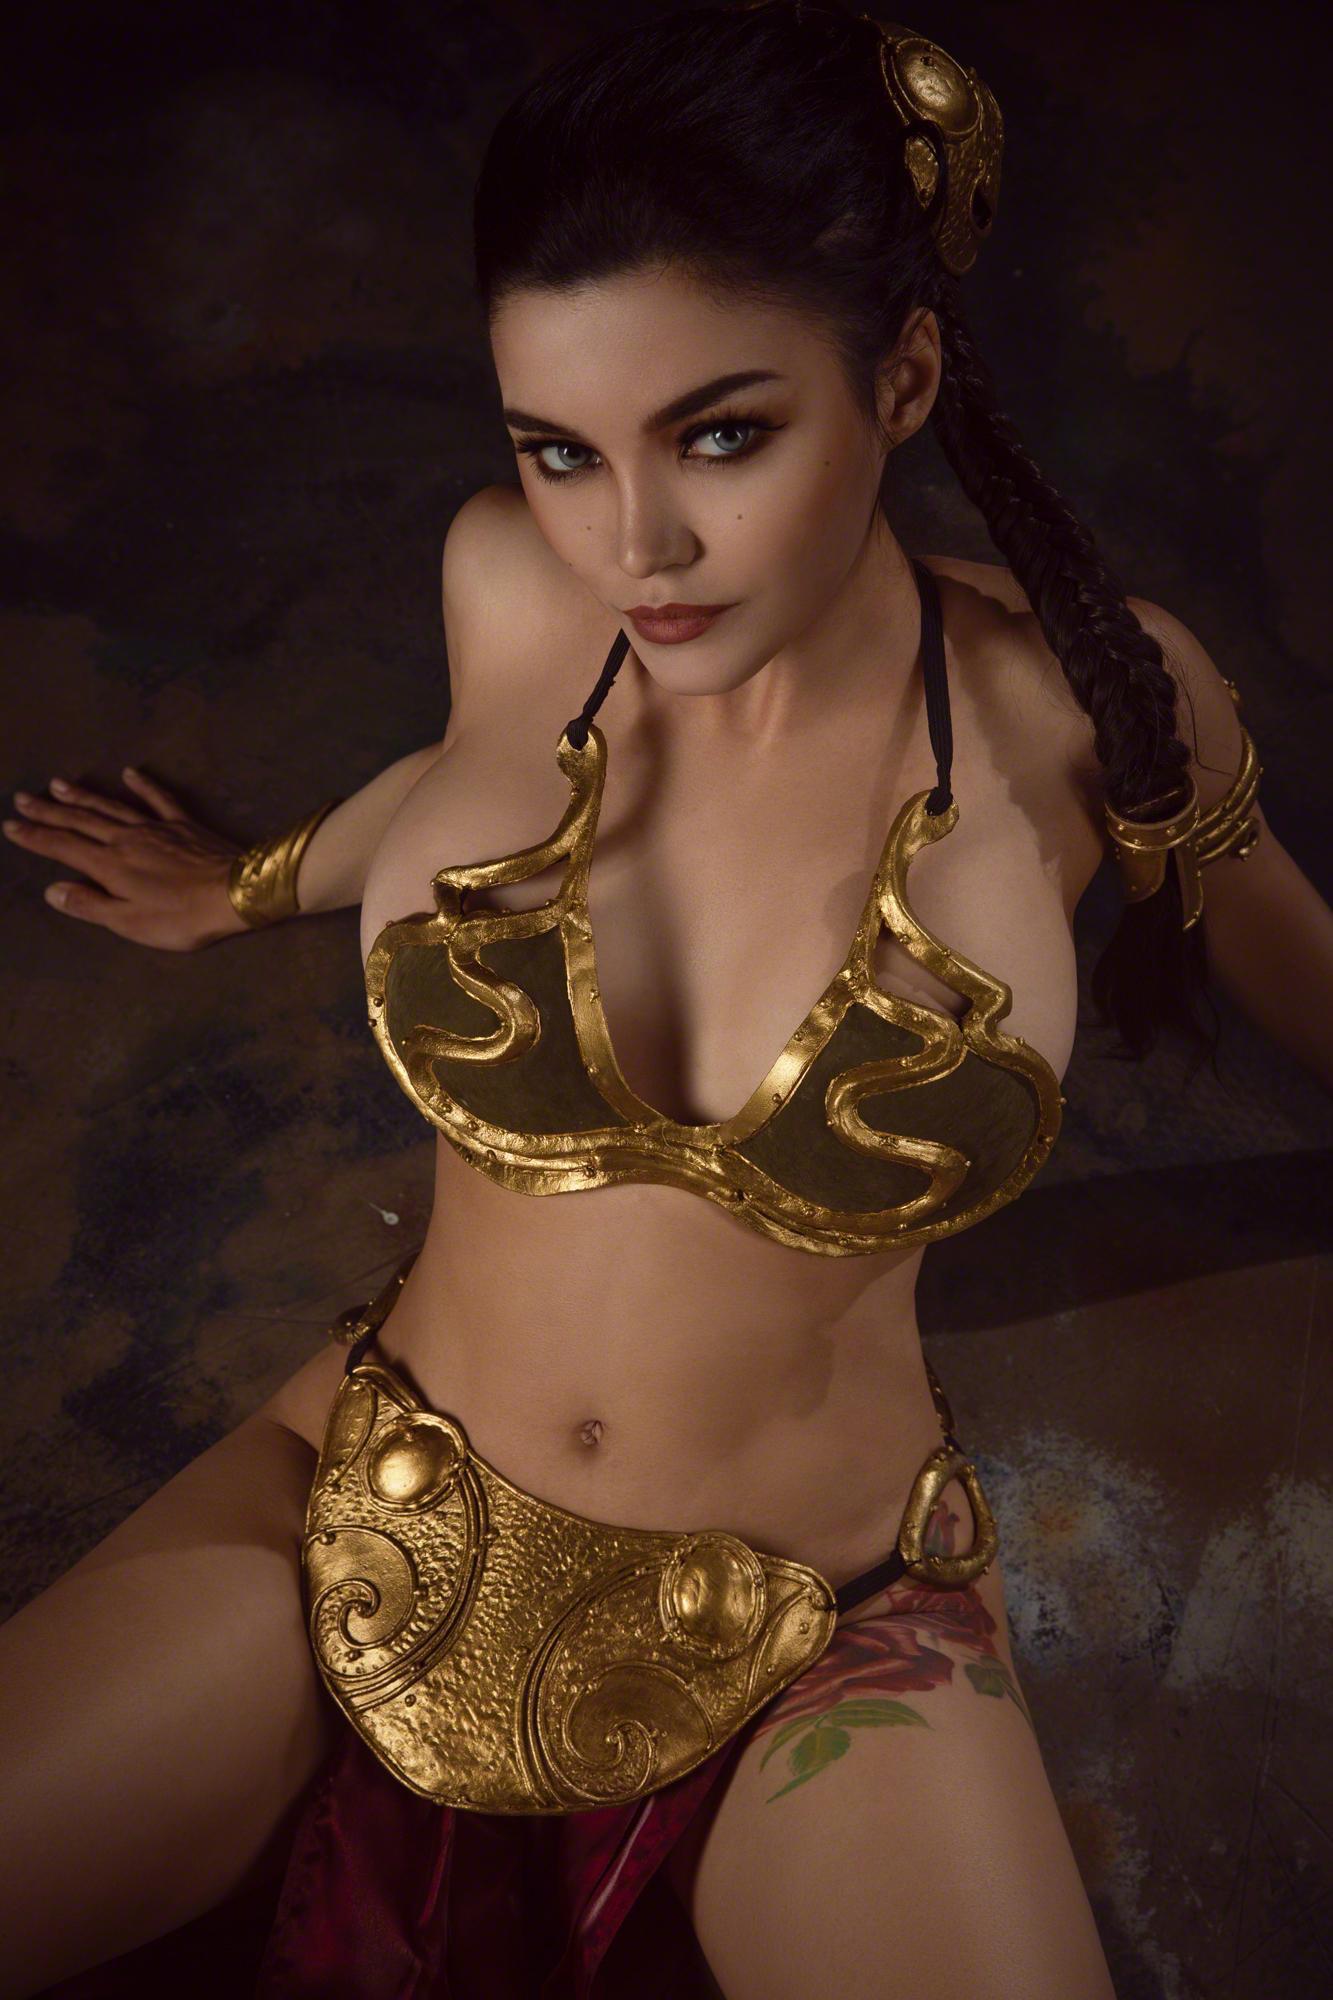 Kalinka Fox Princess Leia Slave Cosplay Set Leaked Mlfmld